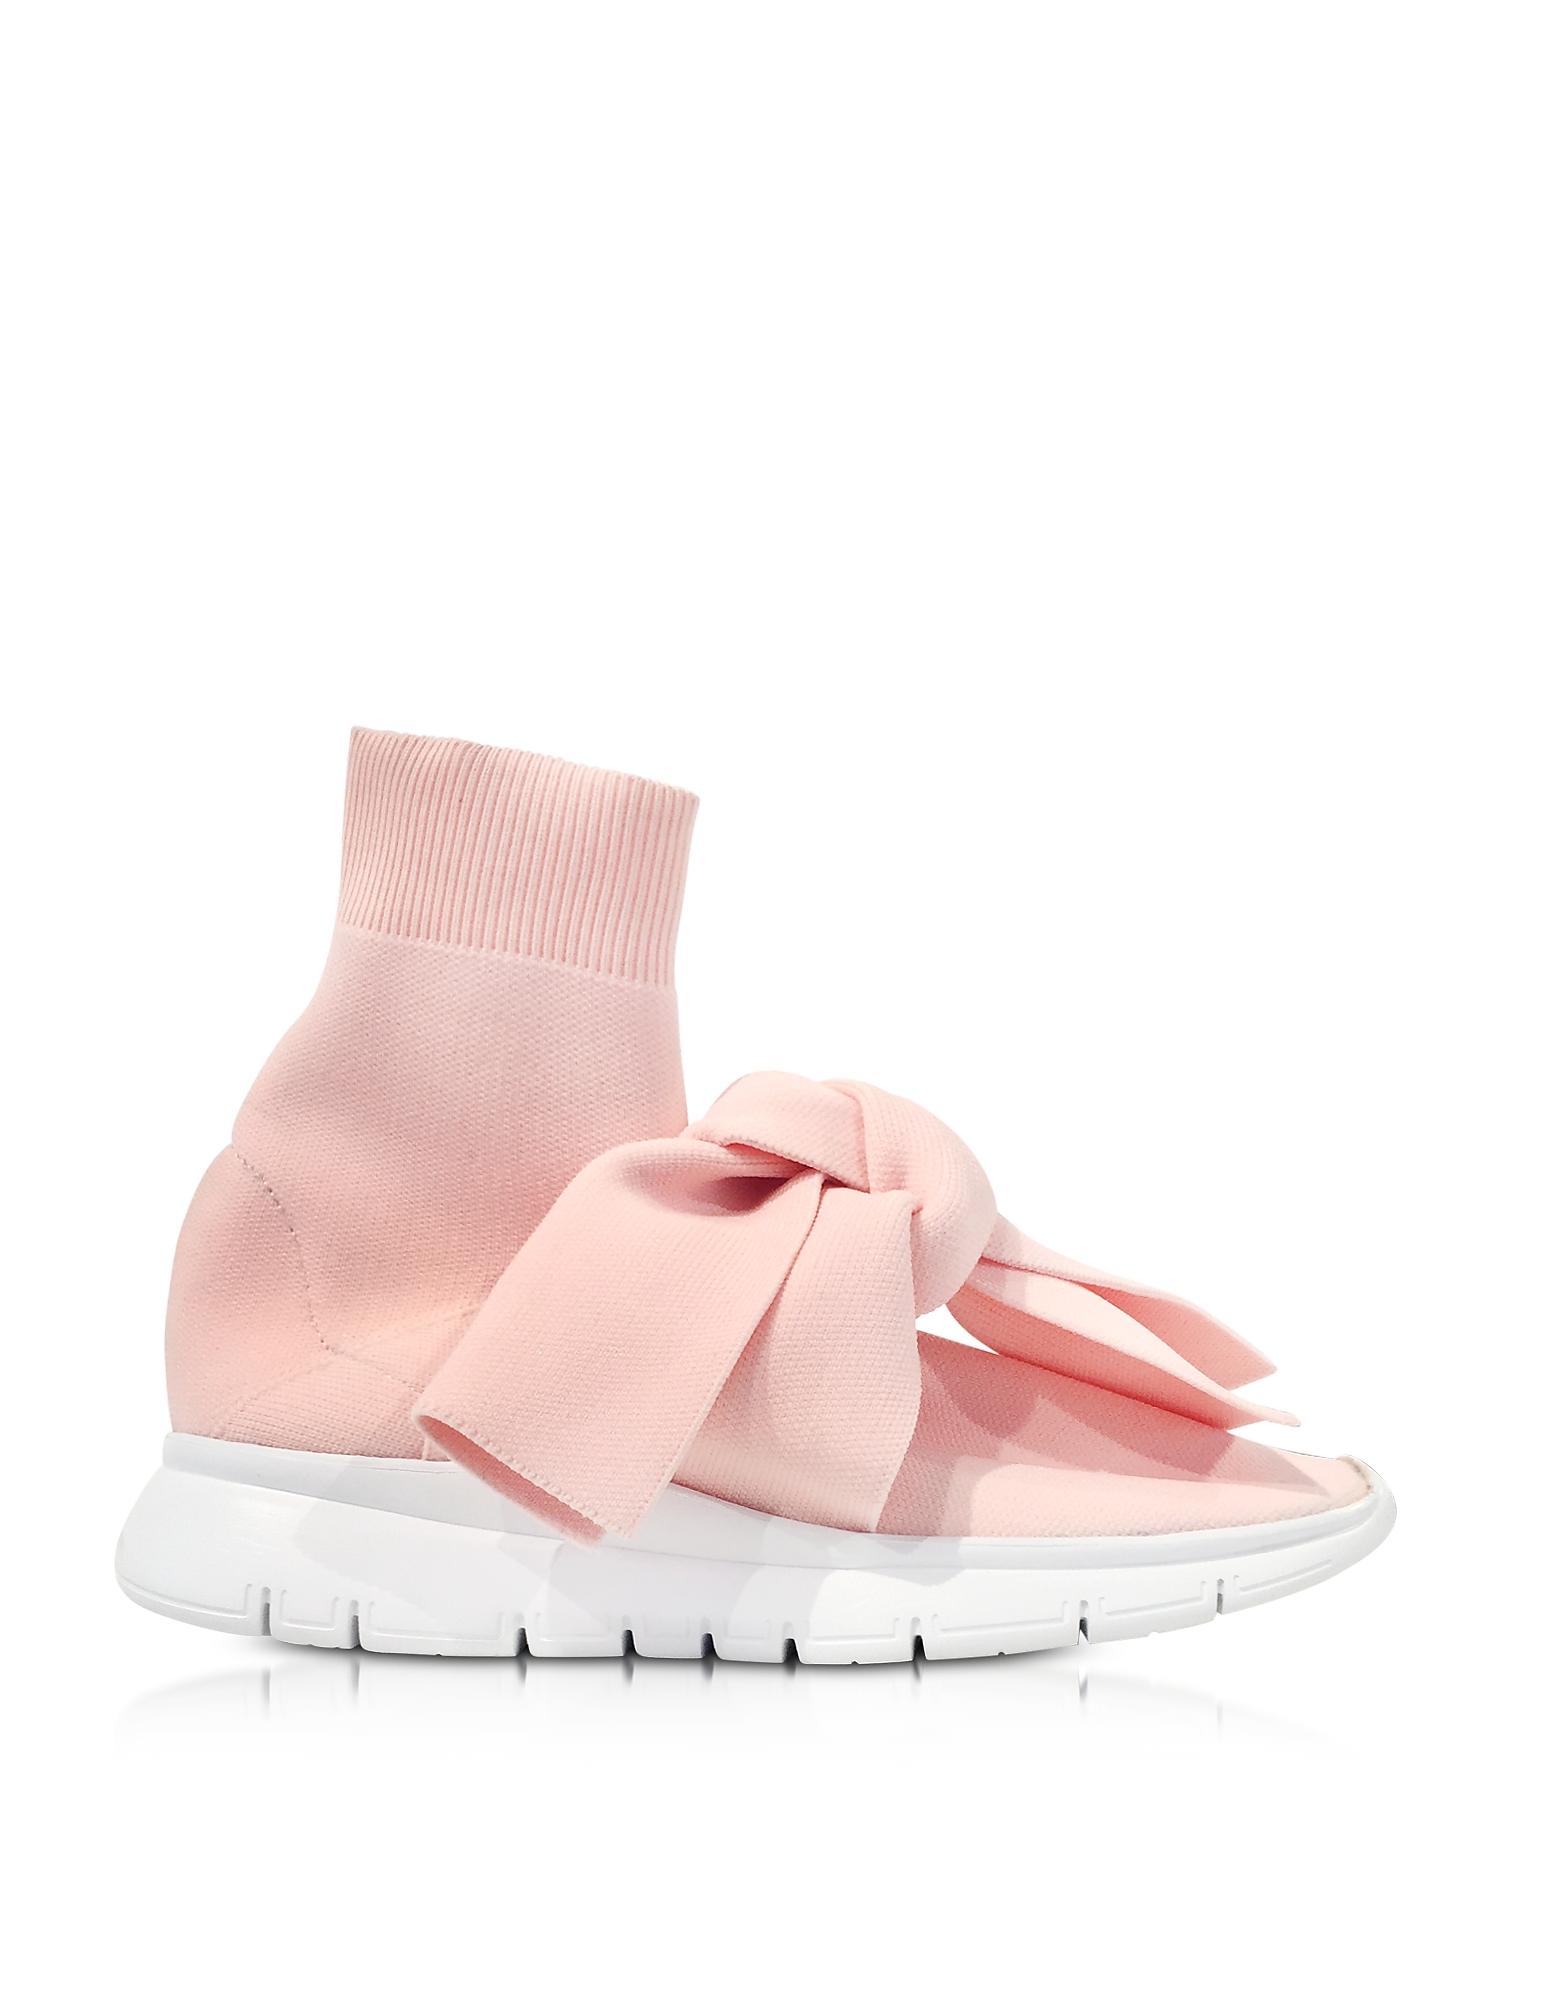 Joshua Sanders Shoes, Knot Pink Nylon Sock Sneakers